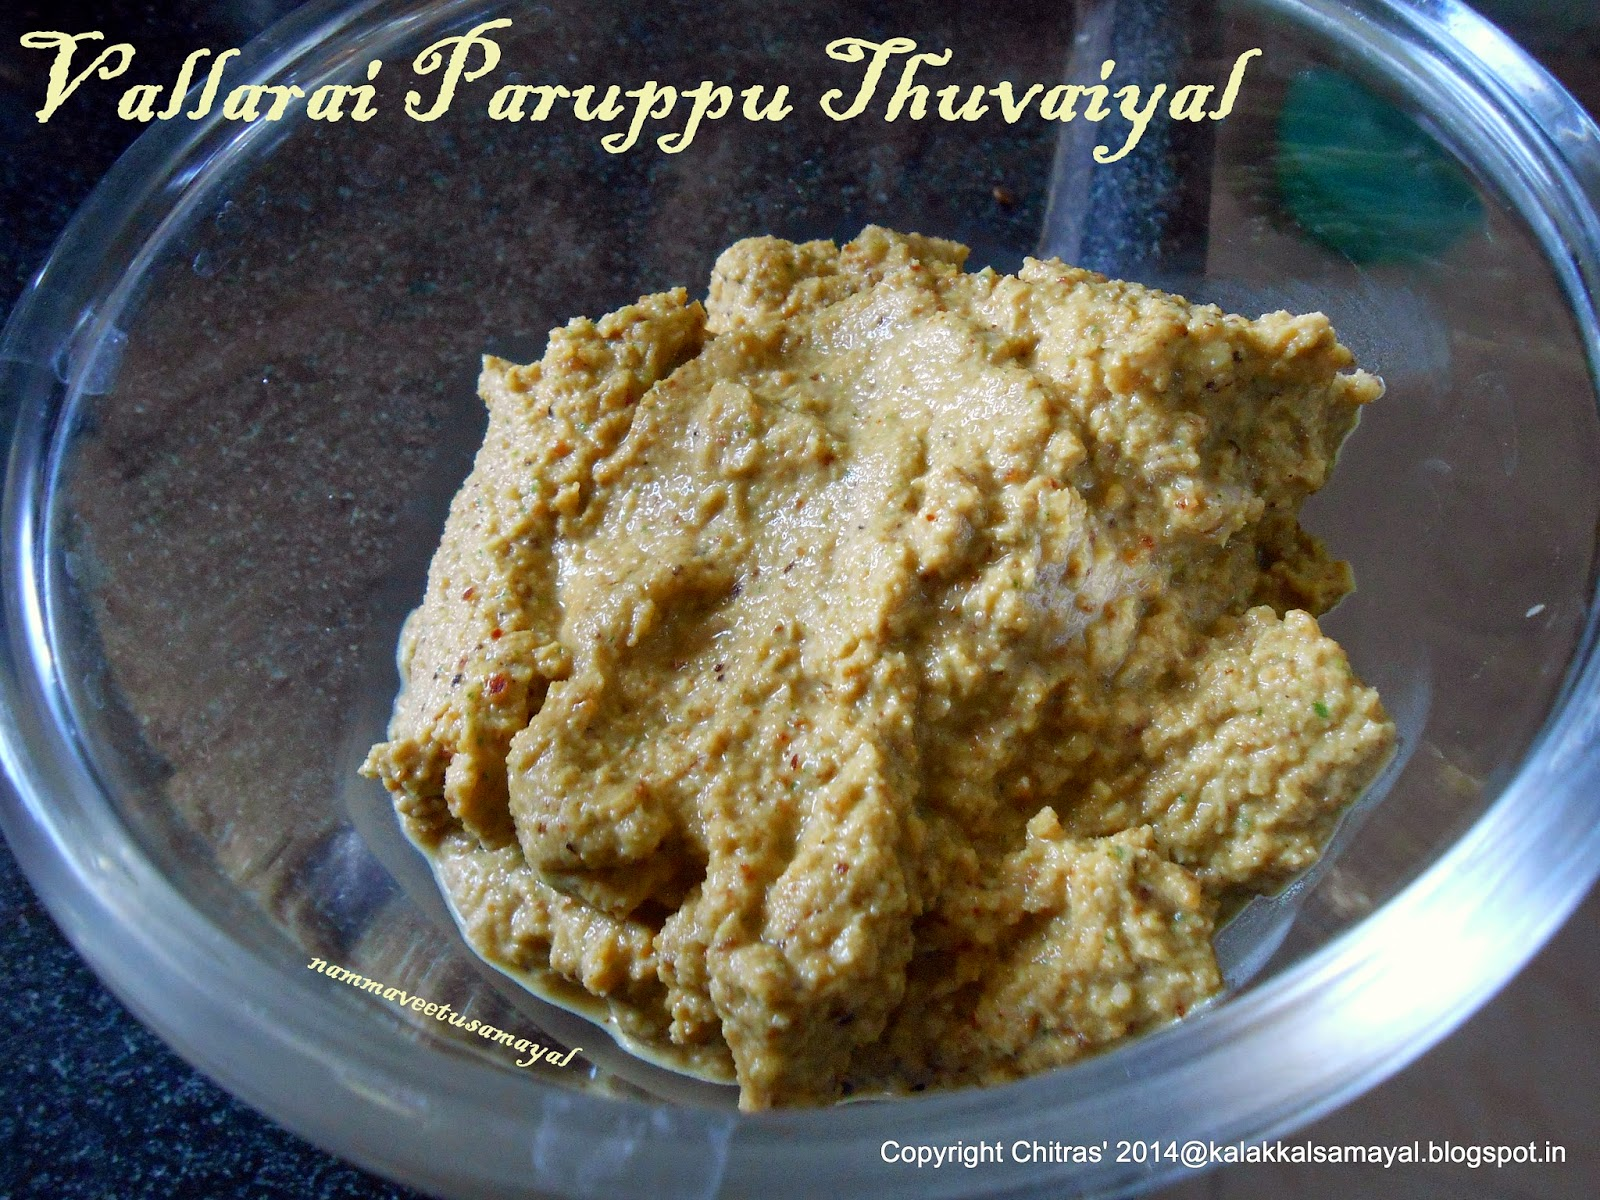 Vallarai [ Centella ] Paruppu Thuvaiyal